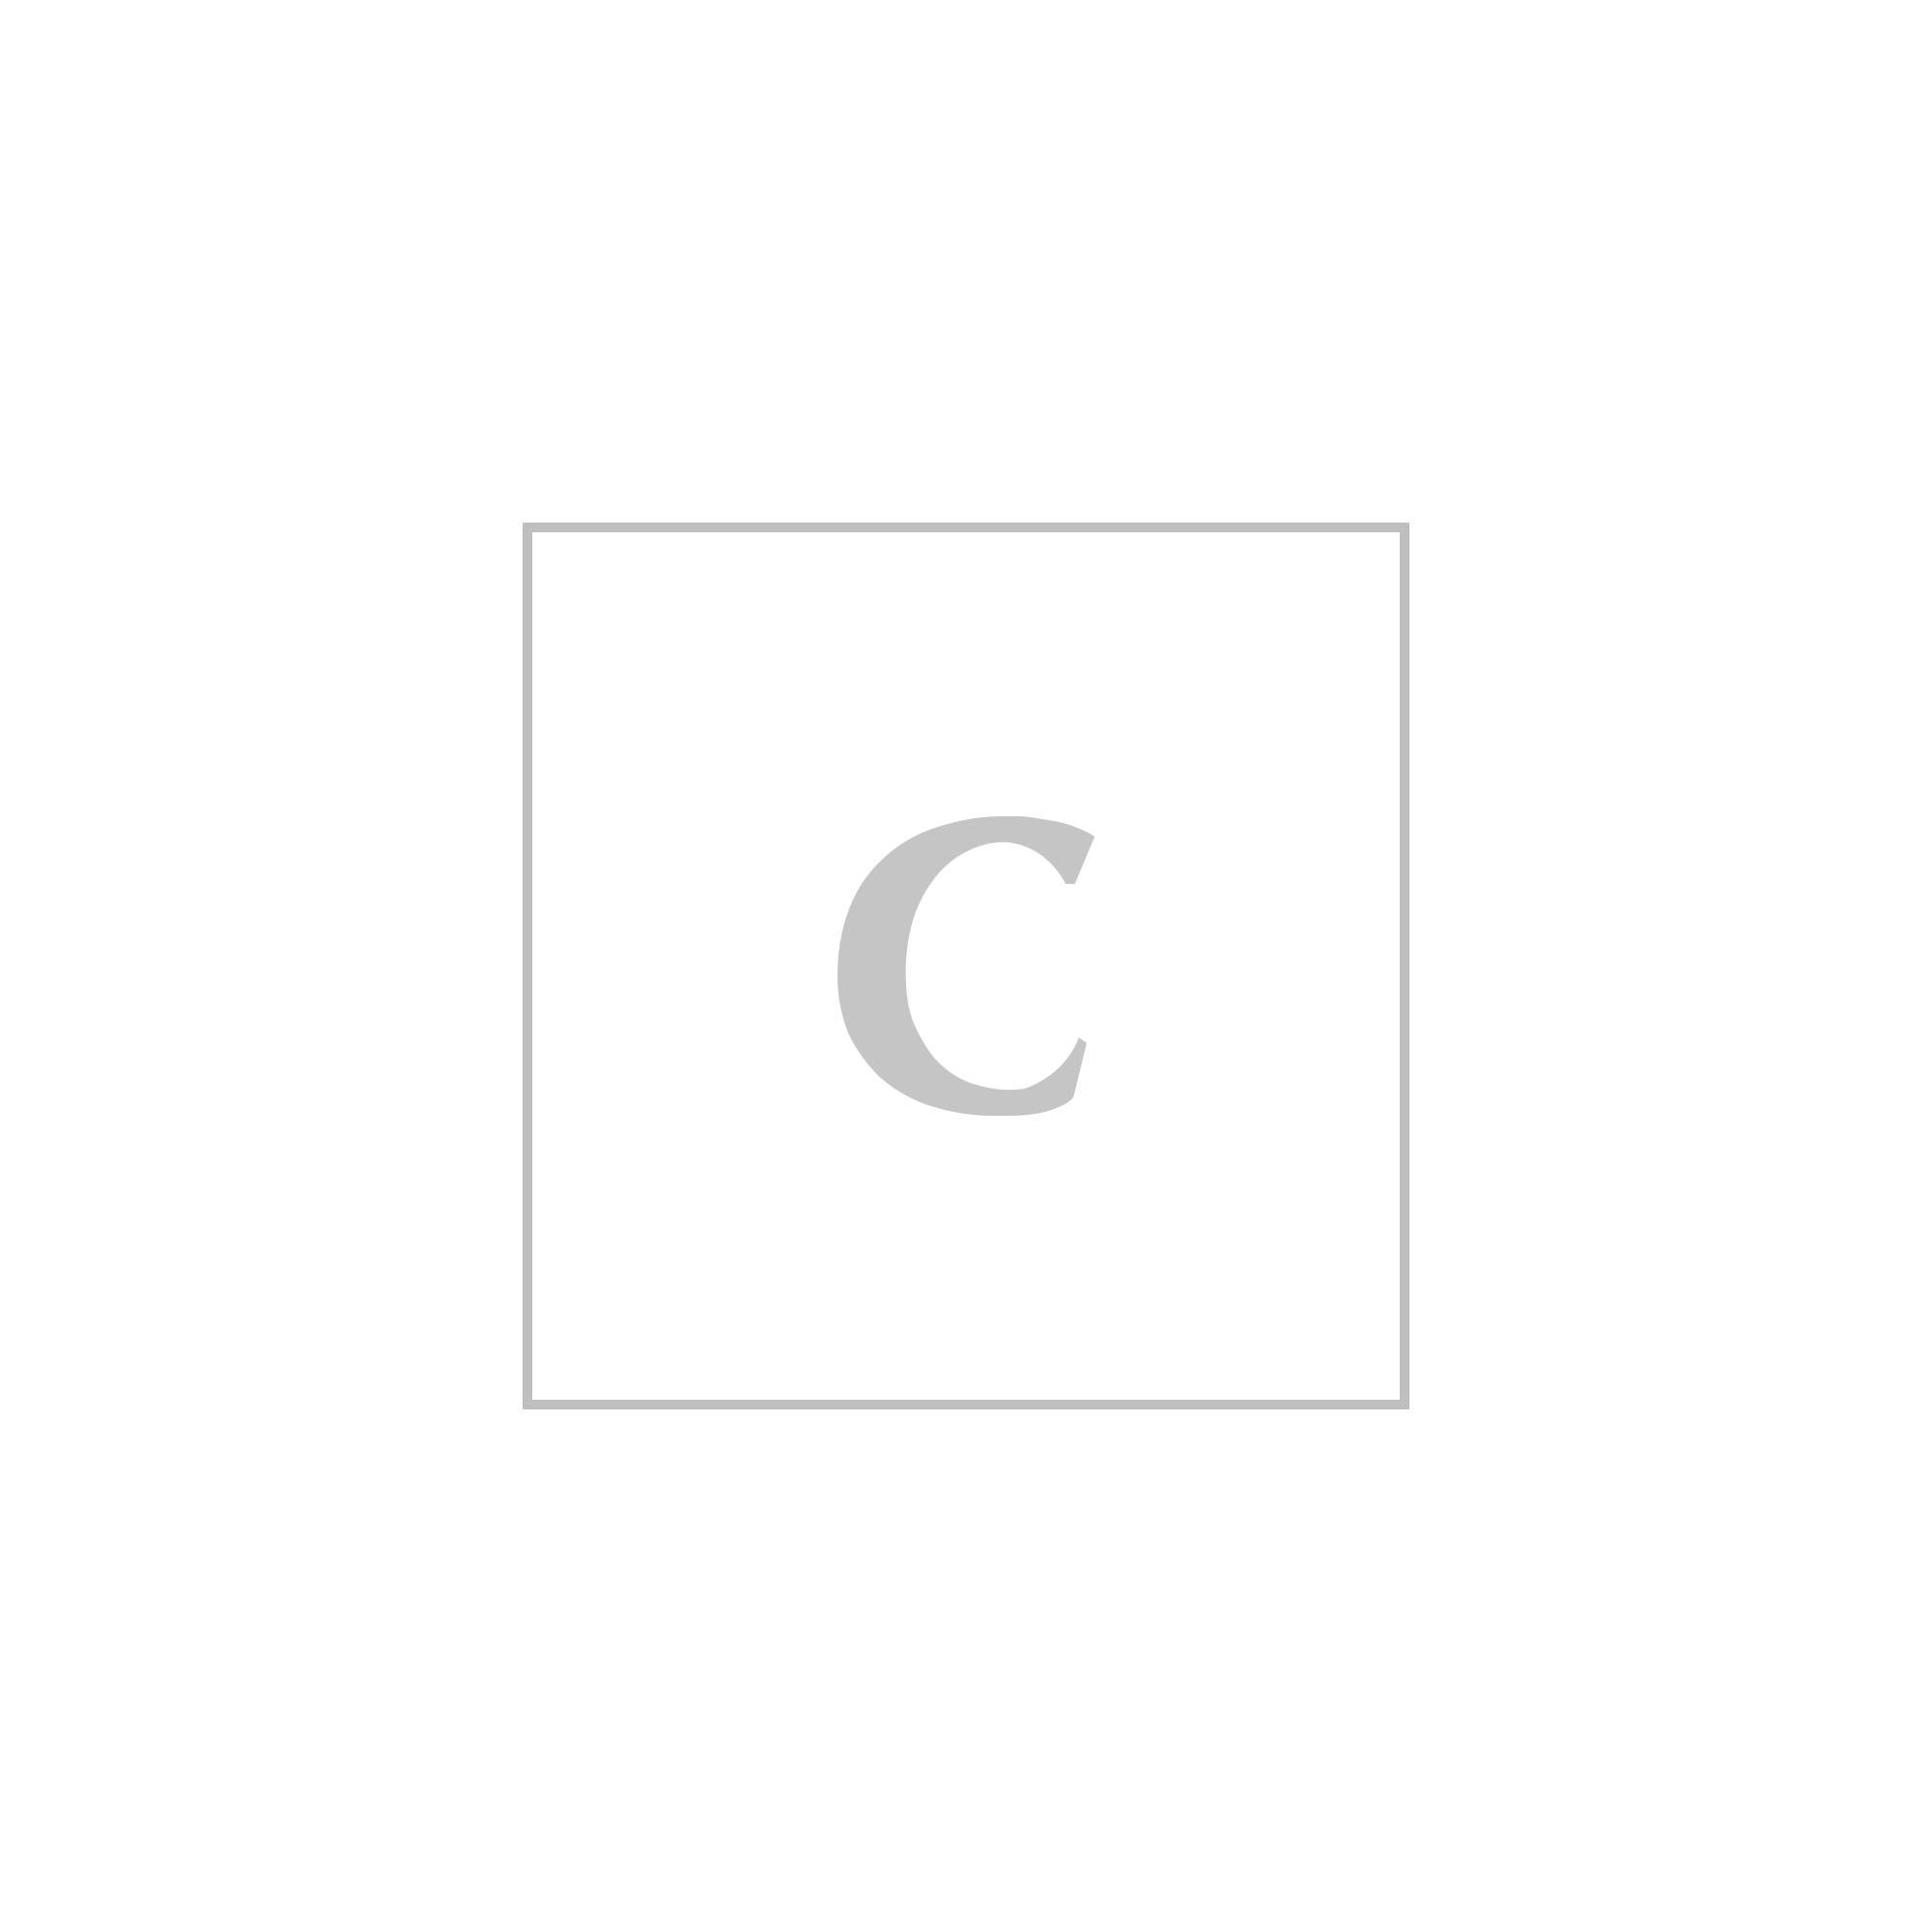 Saint laurent monogram mini bag